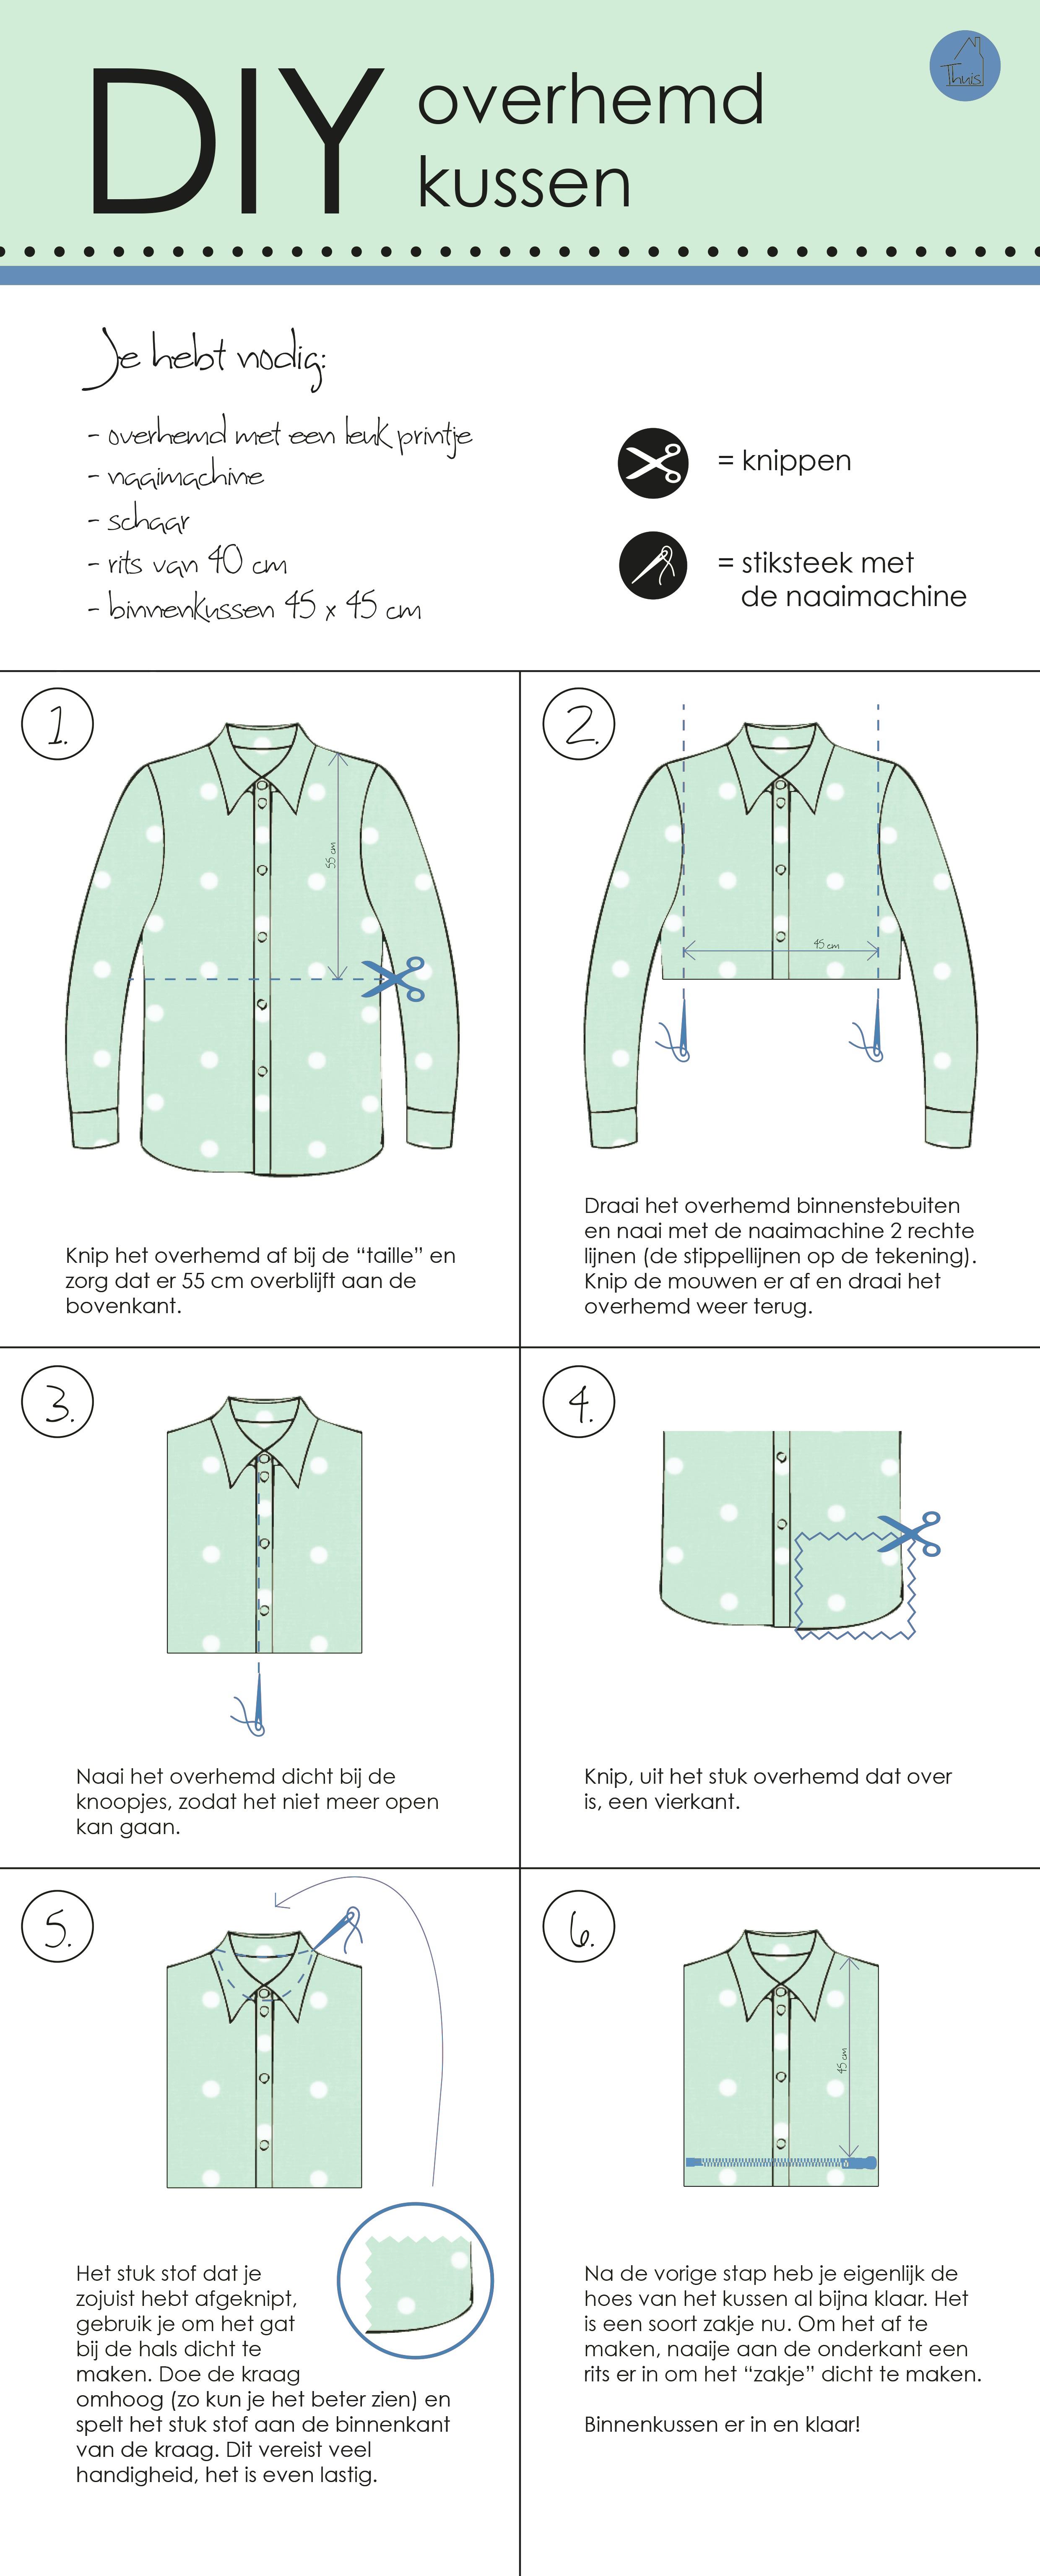 DIY overhemd kussens